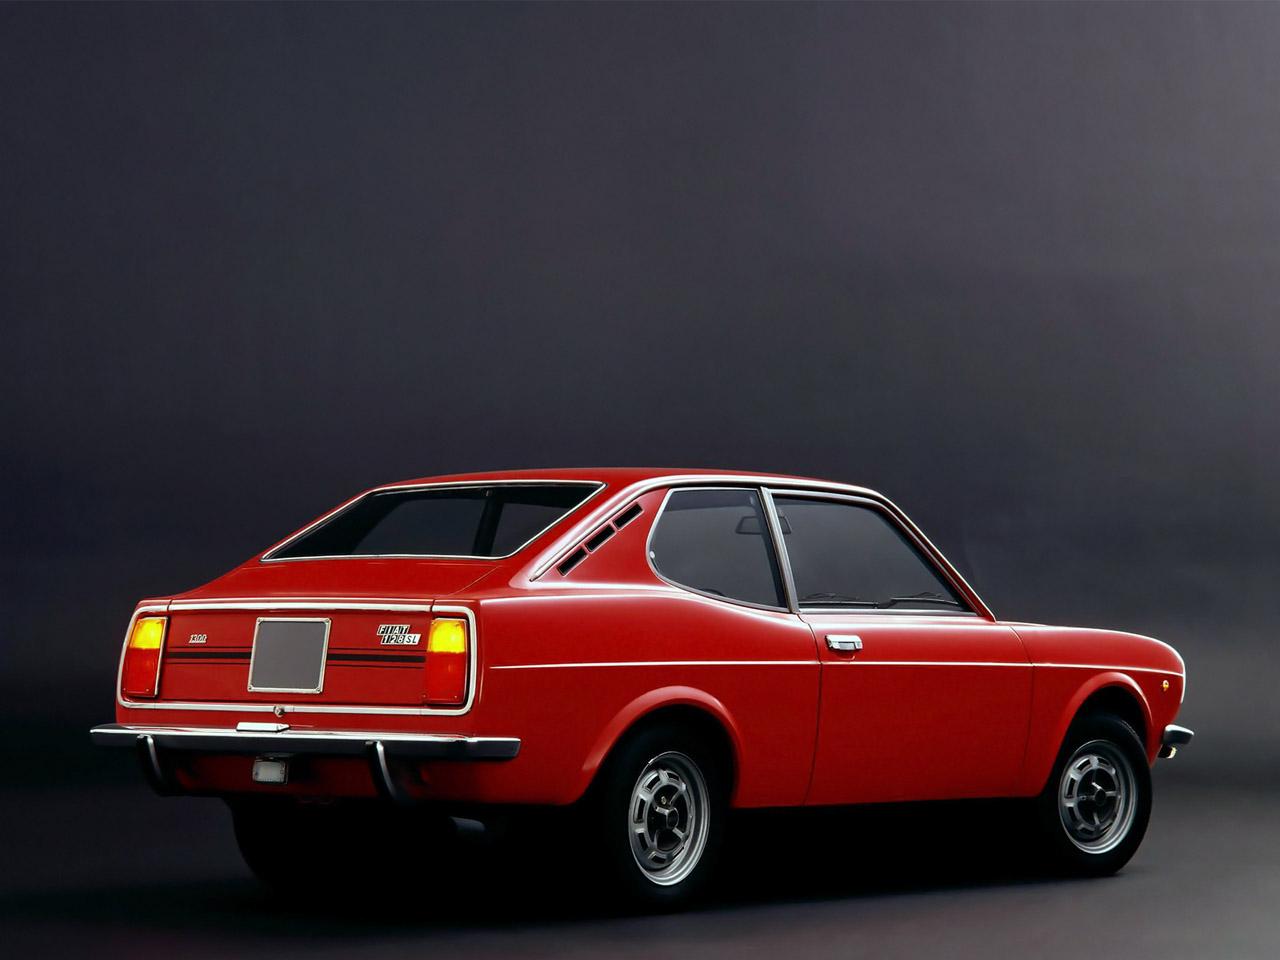 Fiat 128 Coupe' SL 1971